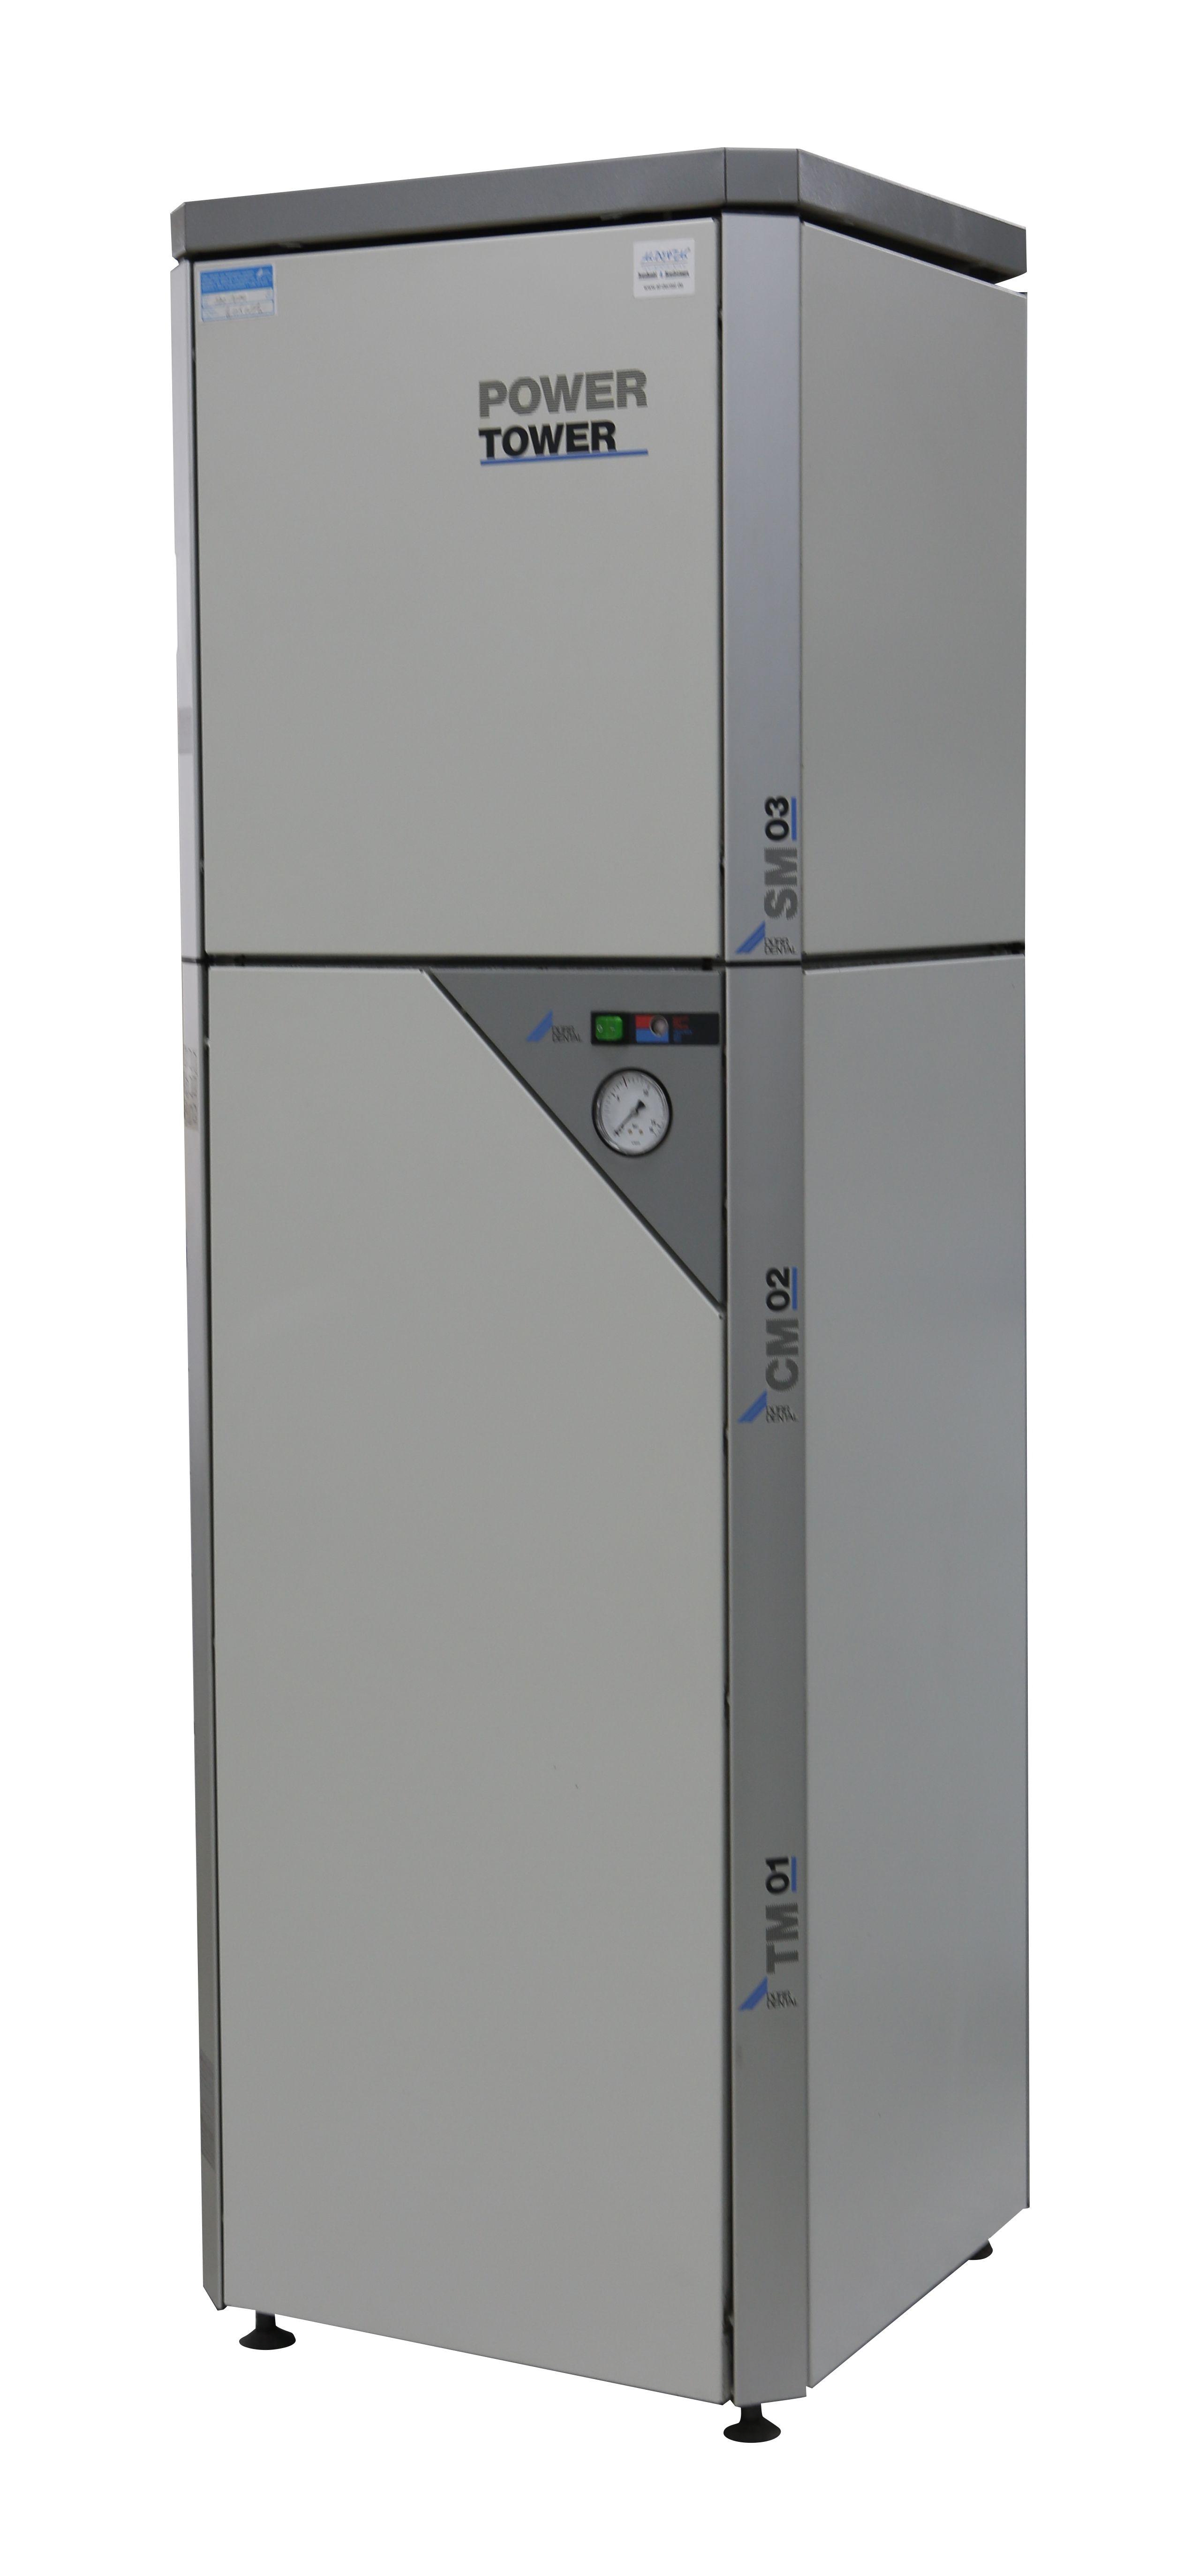 Dürr Power Tower 2 stöckig - Kompressor, Absaugung, Dental